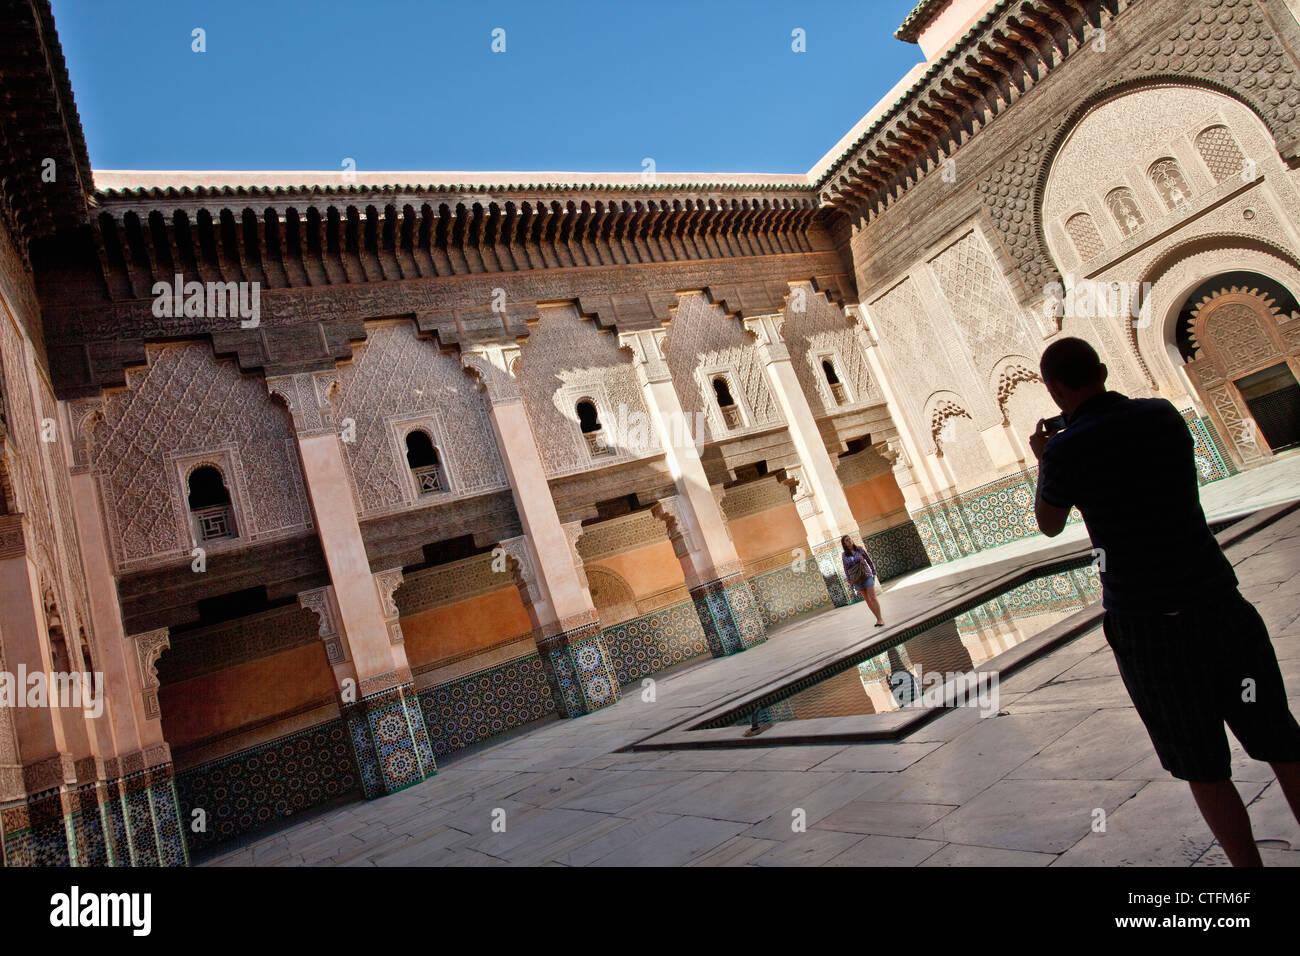 Morocco, Marrakech Medina, Ali ben Youssef Medersa. - Stock Image